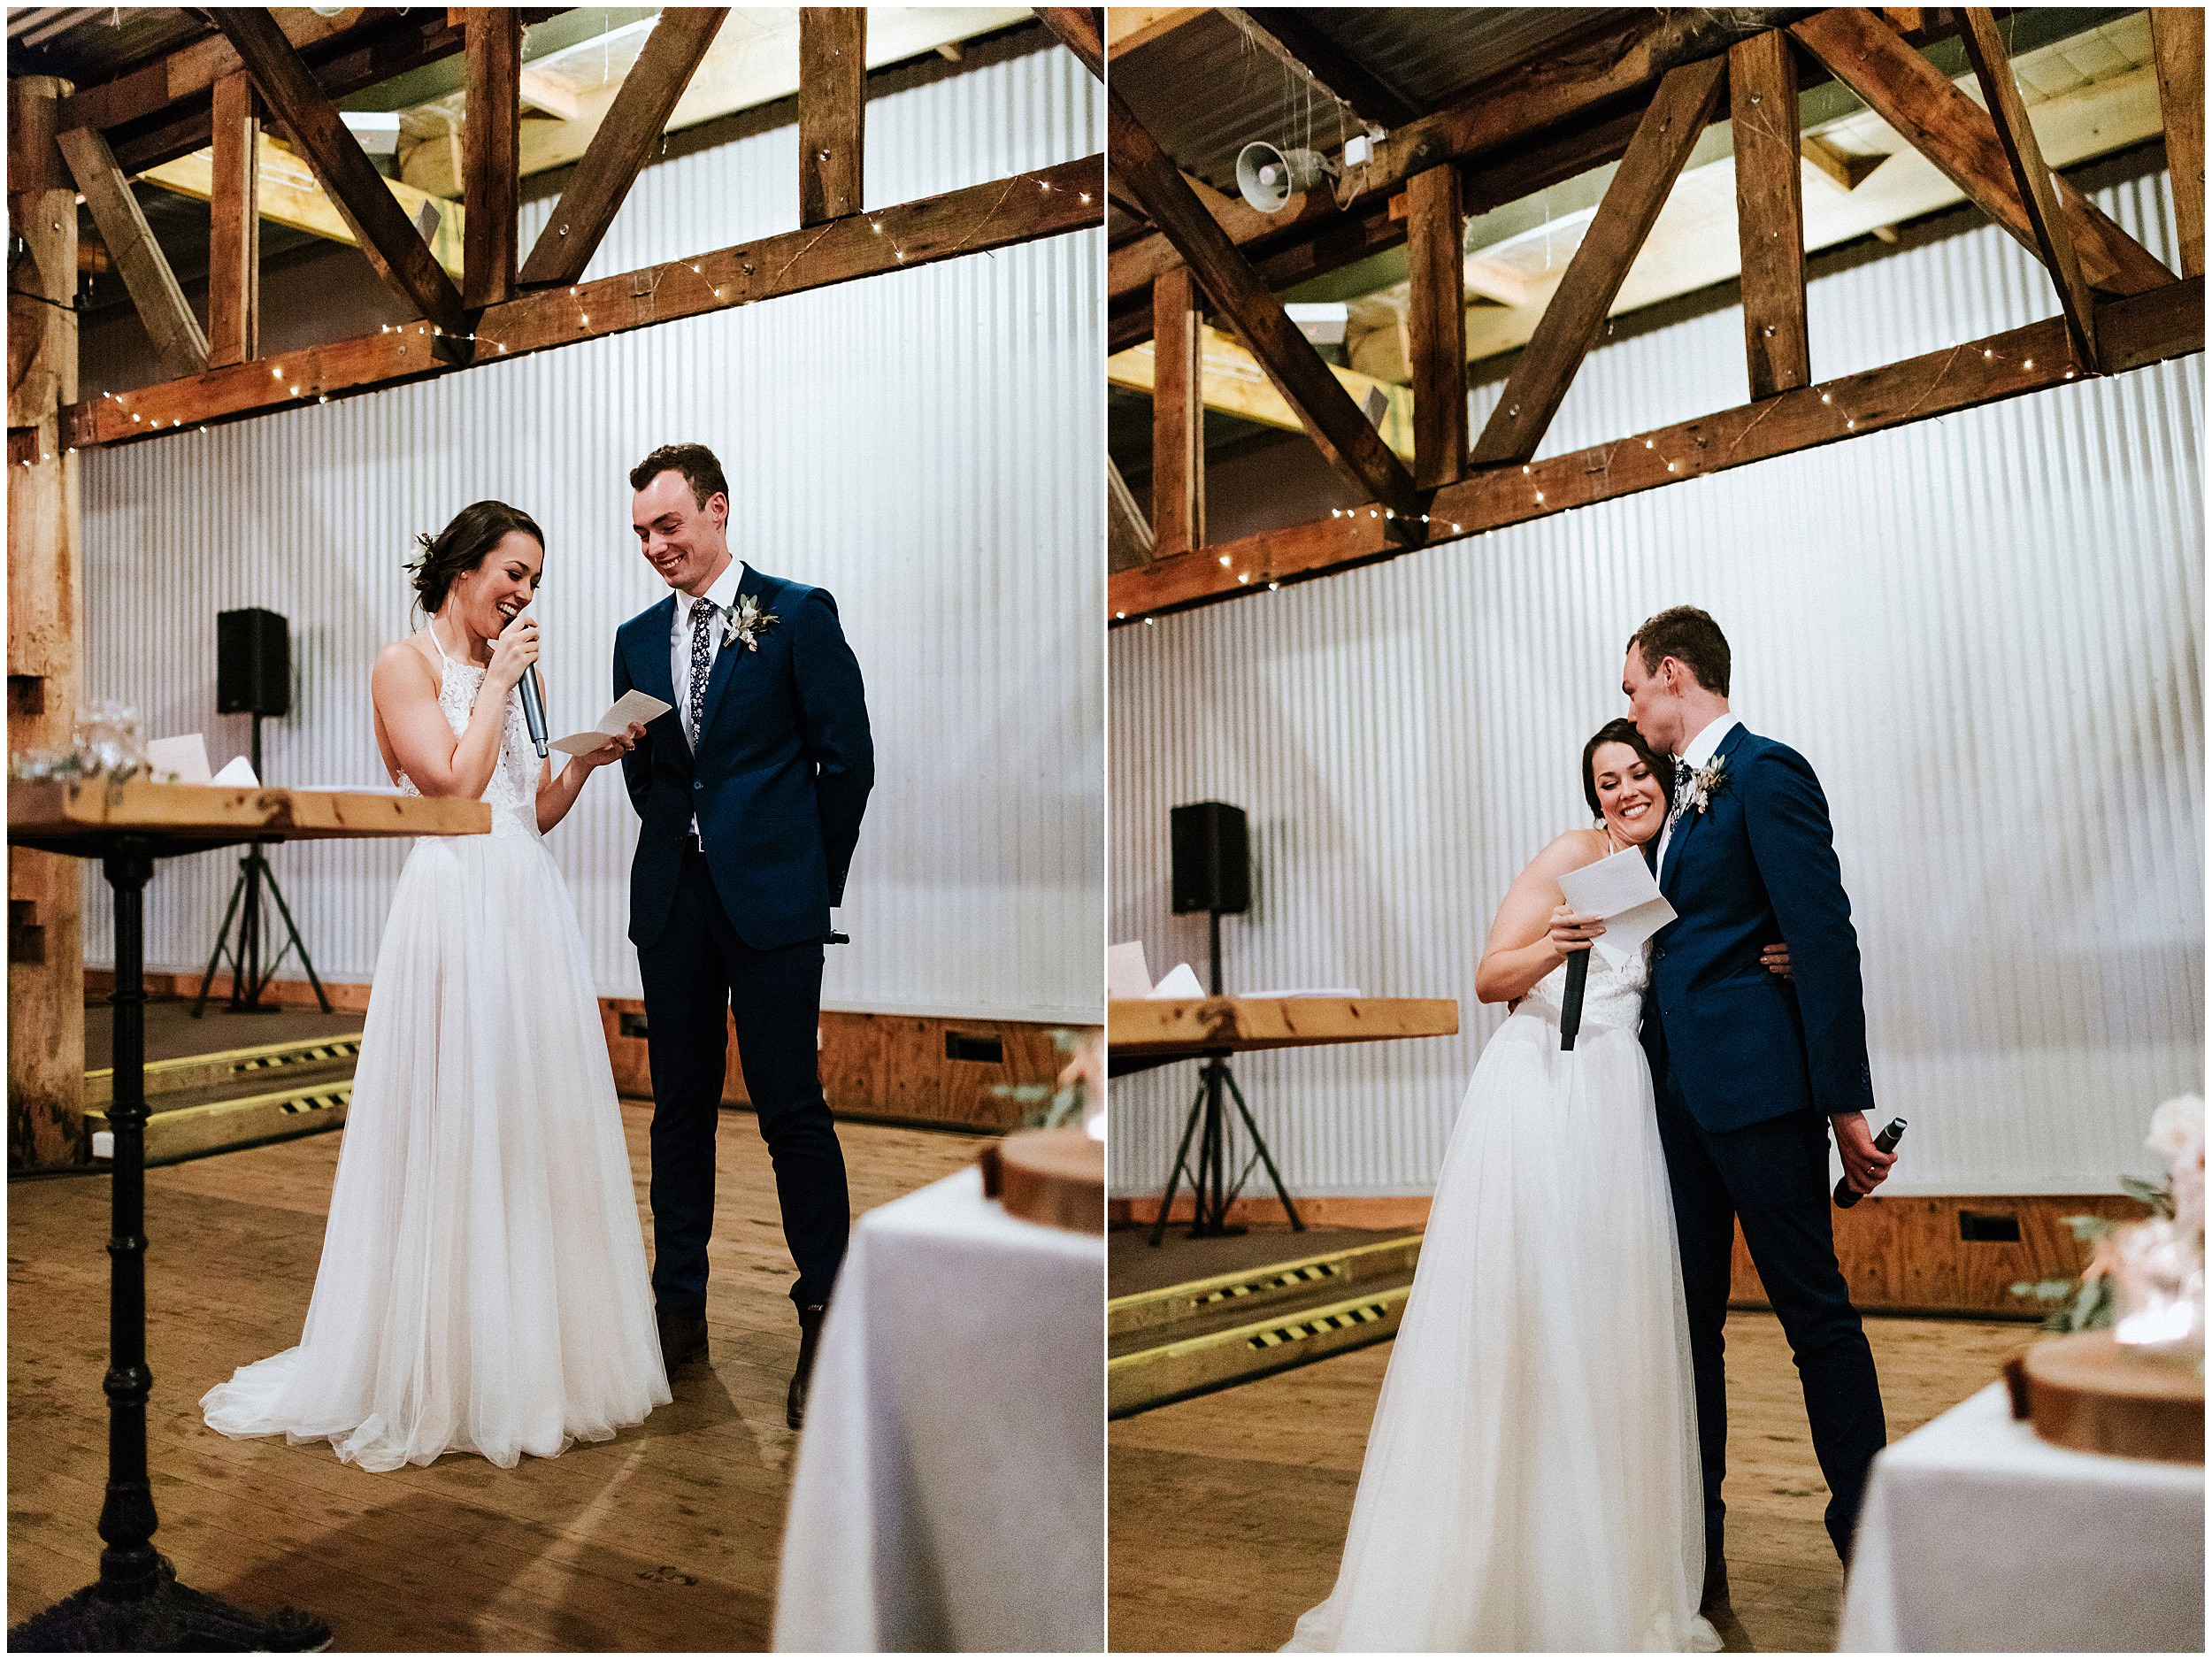 wedding_the_woolshed_steph_zac_0076.jpg